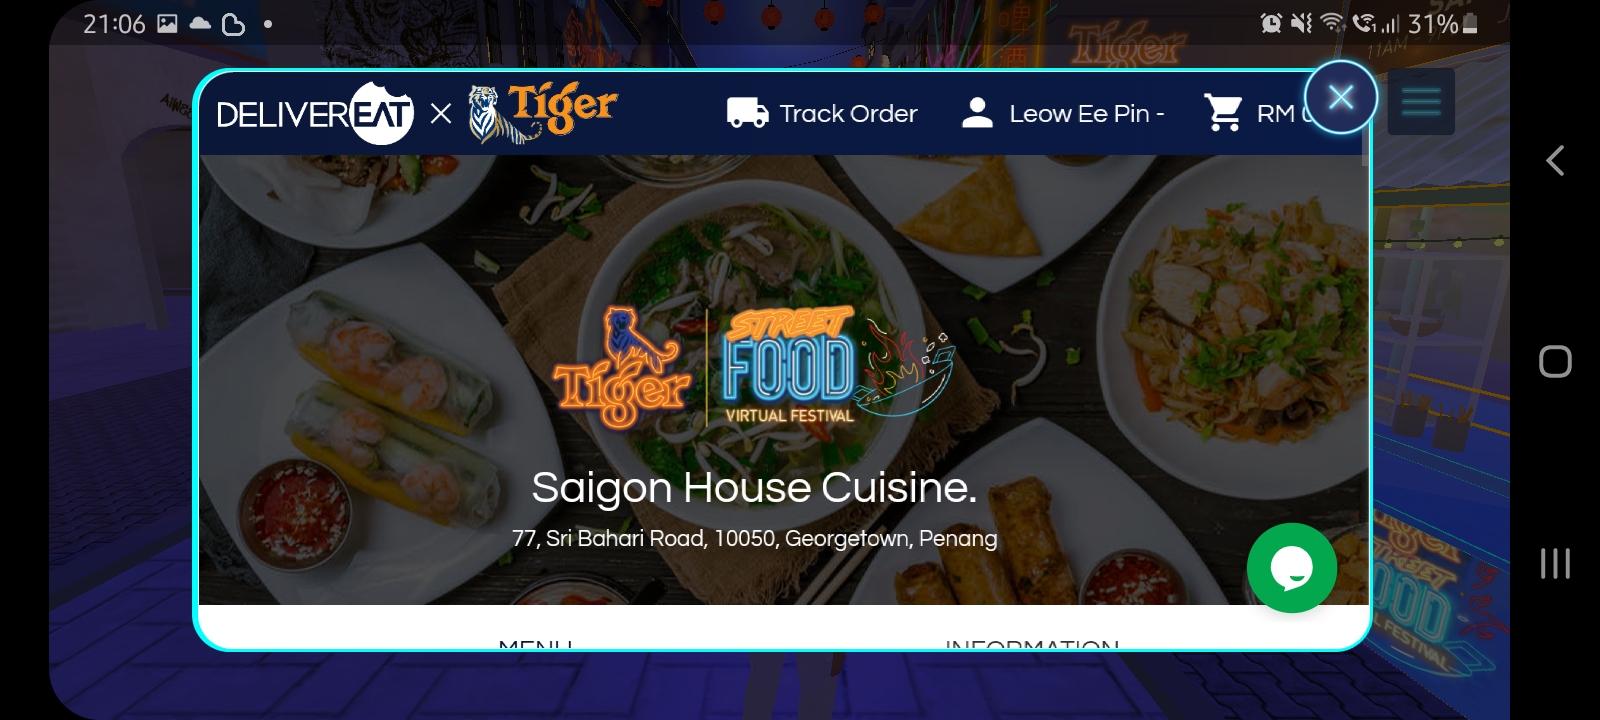 Tiger Street Food Virtual Festival